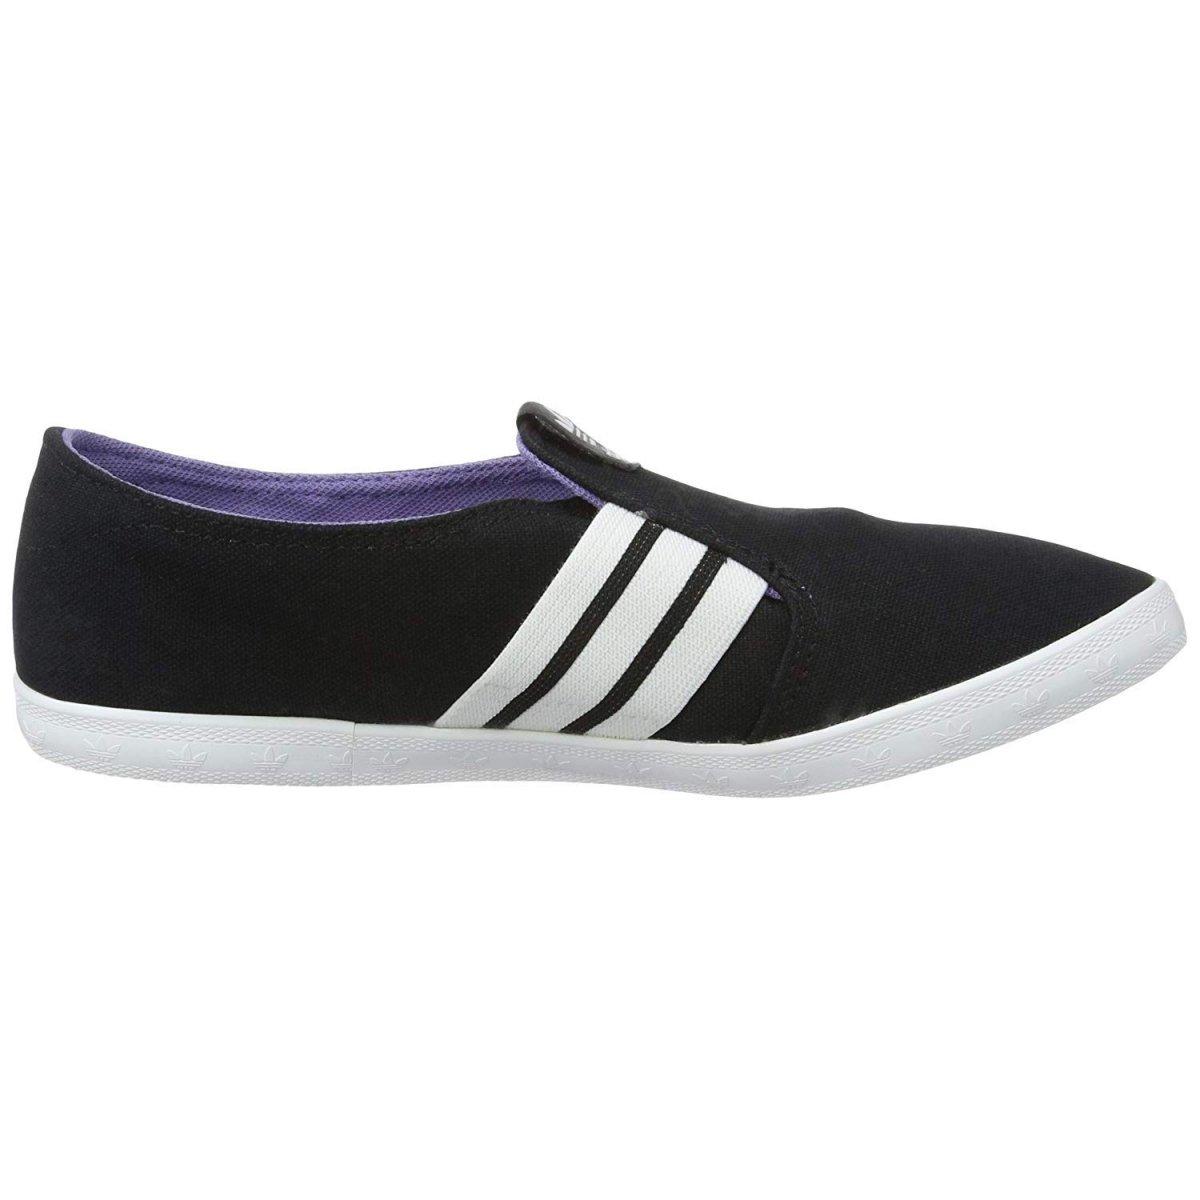 best sneakers e9901 465ef ADIDAS ORIGINALS BUTY ADRIA PS SLIP-ON M19530